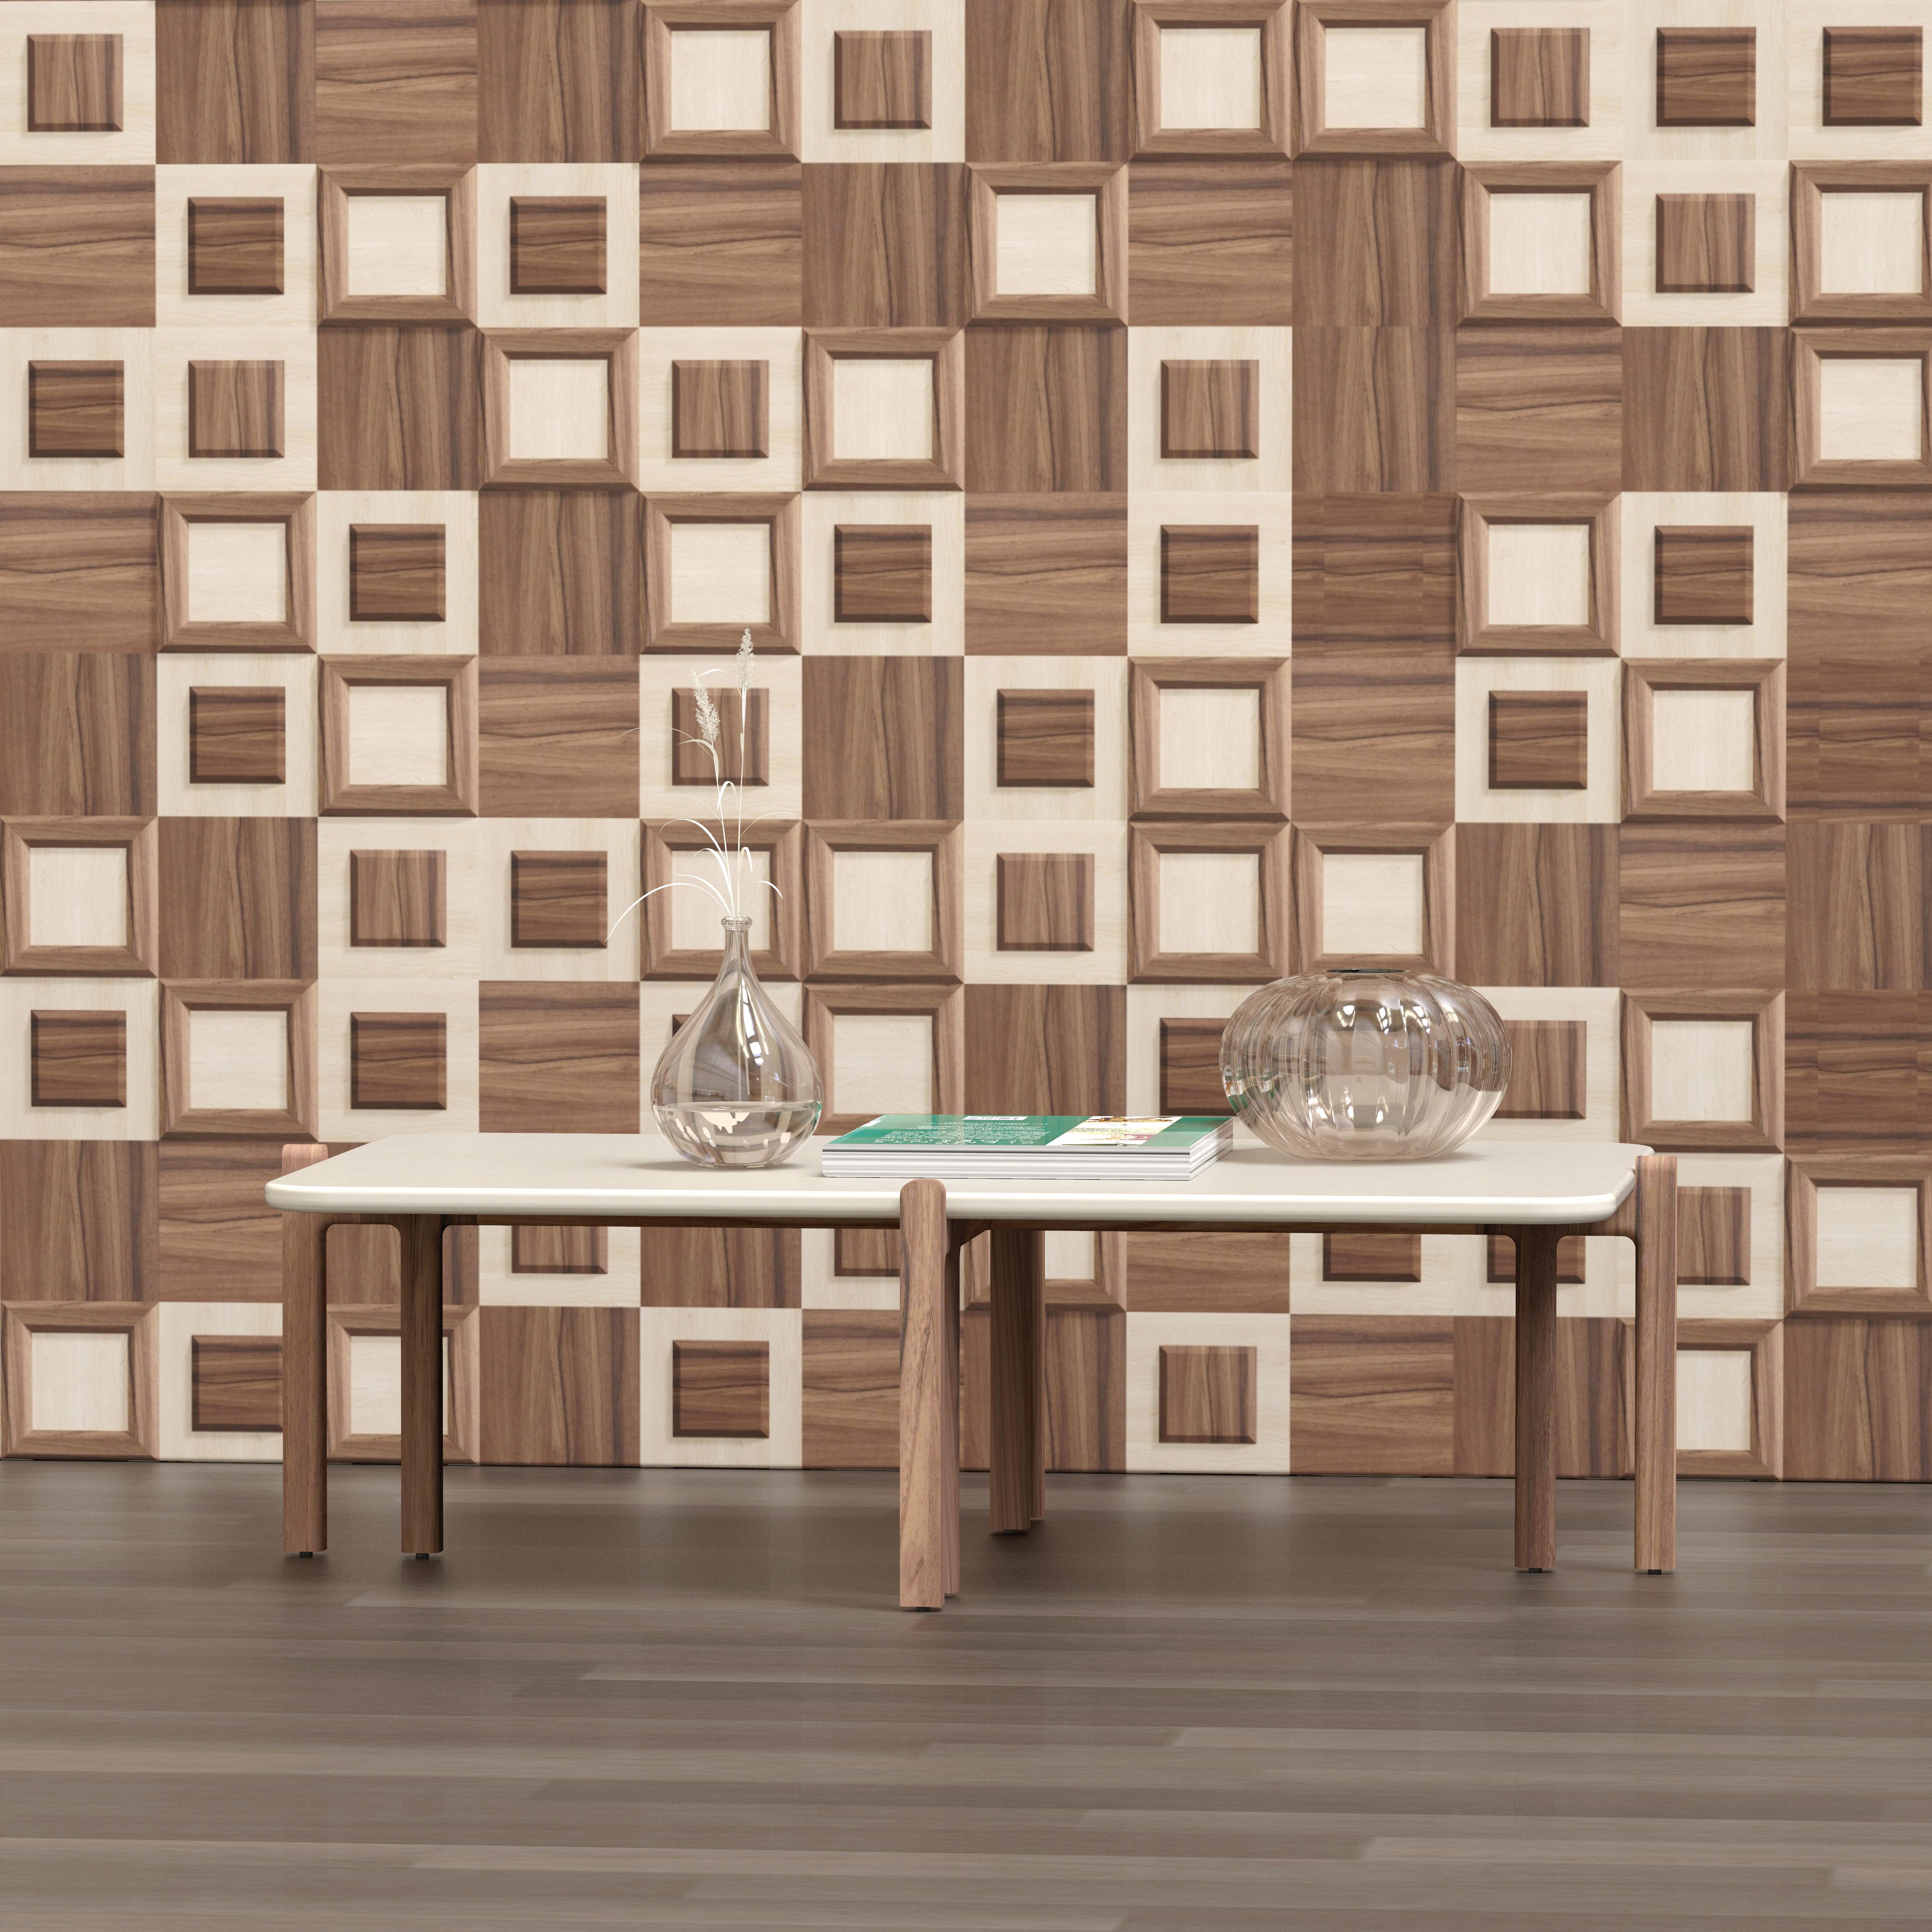 pontile coffee table and matrix wall panels lq.jpg